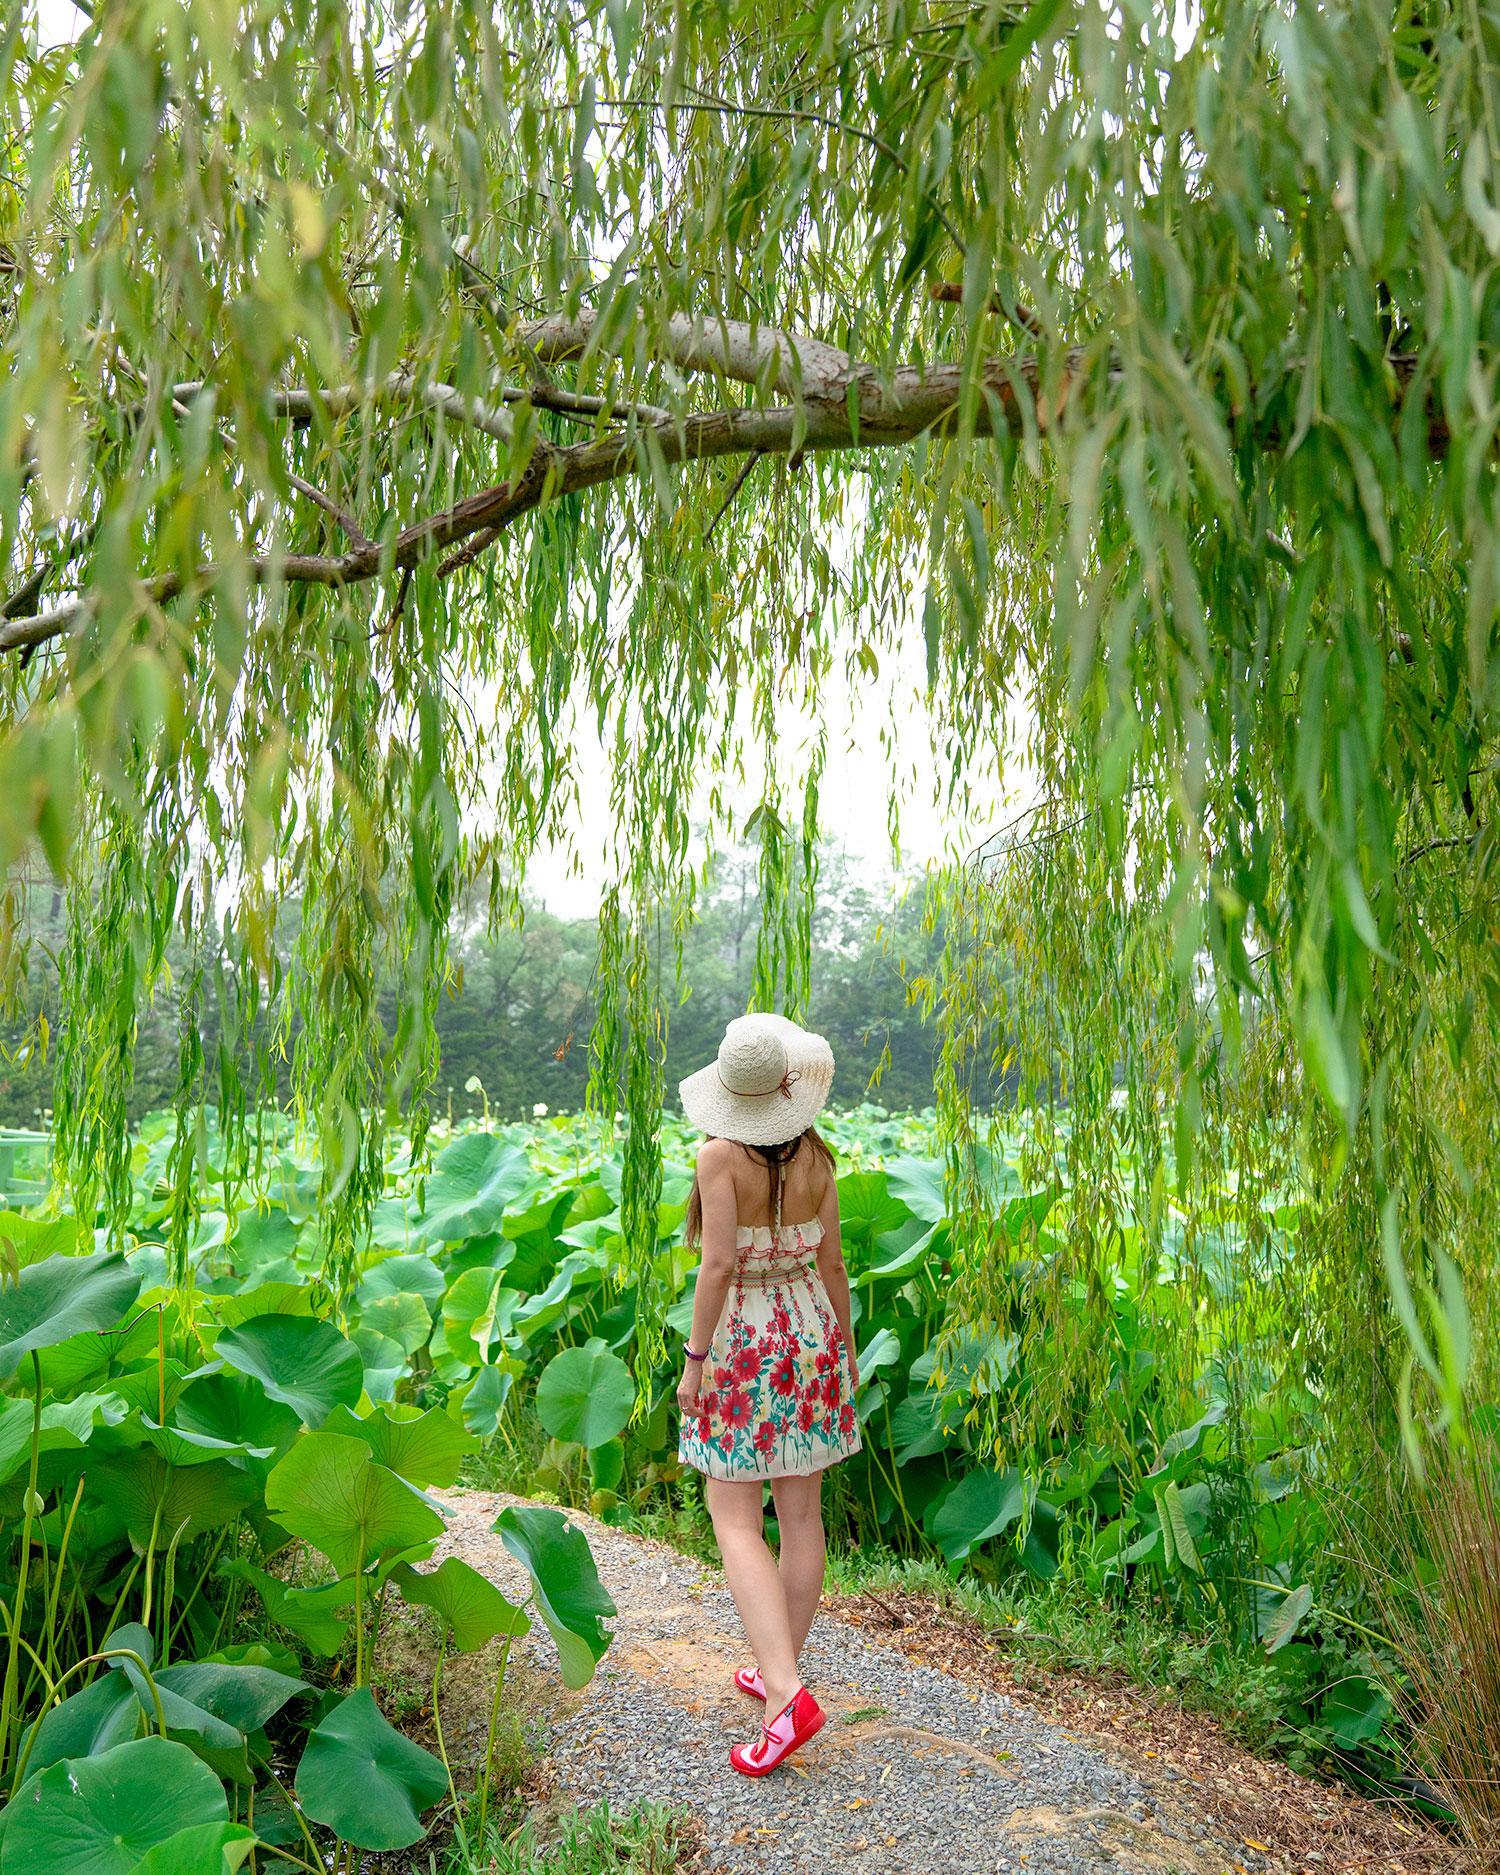 Artist Thaneeya McArdle at Blue Lotus Water Garden in Yarra Valley, Victoria, Australia